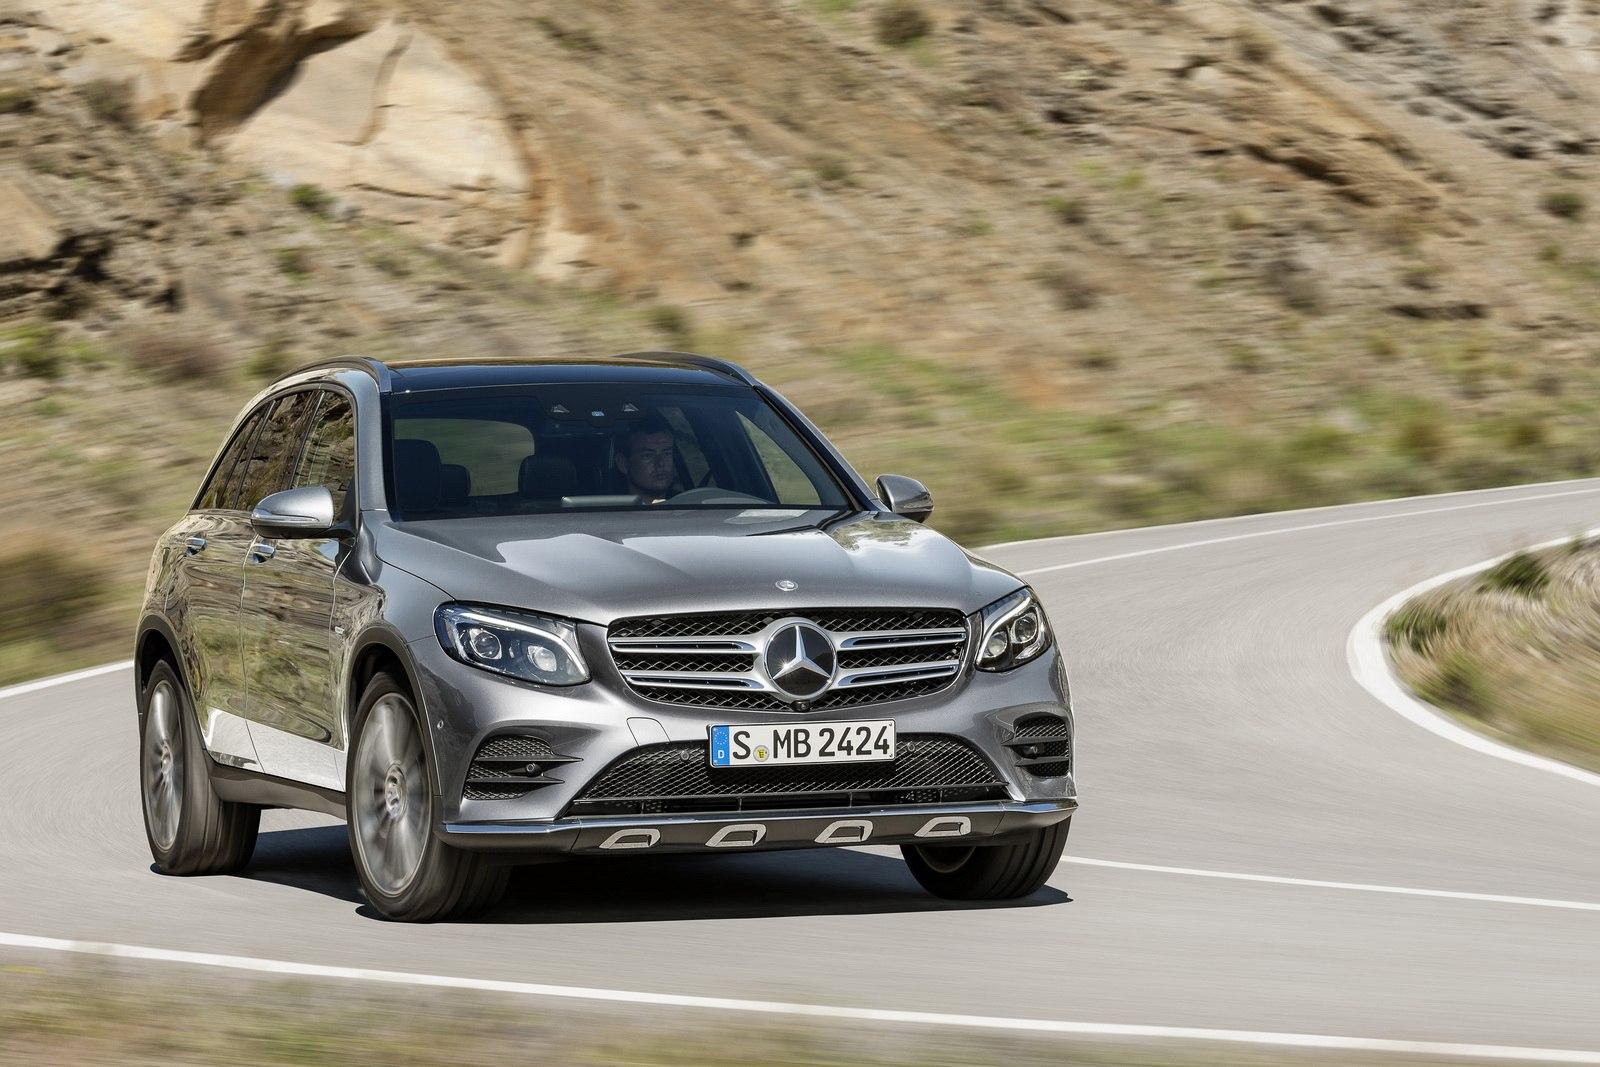 Mercedes-Benz GLC 350e 4MATIC, EDITION 1, SELENITGRAU, AMG Line ExterieurMercedes-Benz GLC 350e 4MATIC EDITION 1, Selenite Grey, AMG Line, Exterior